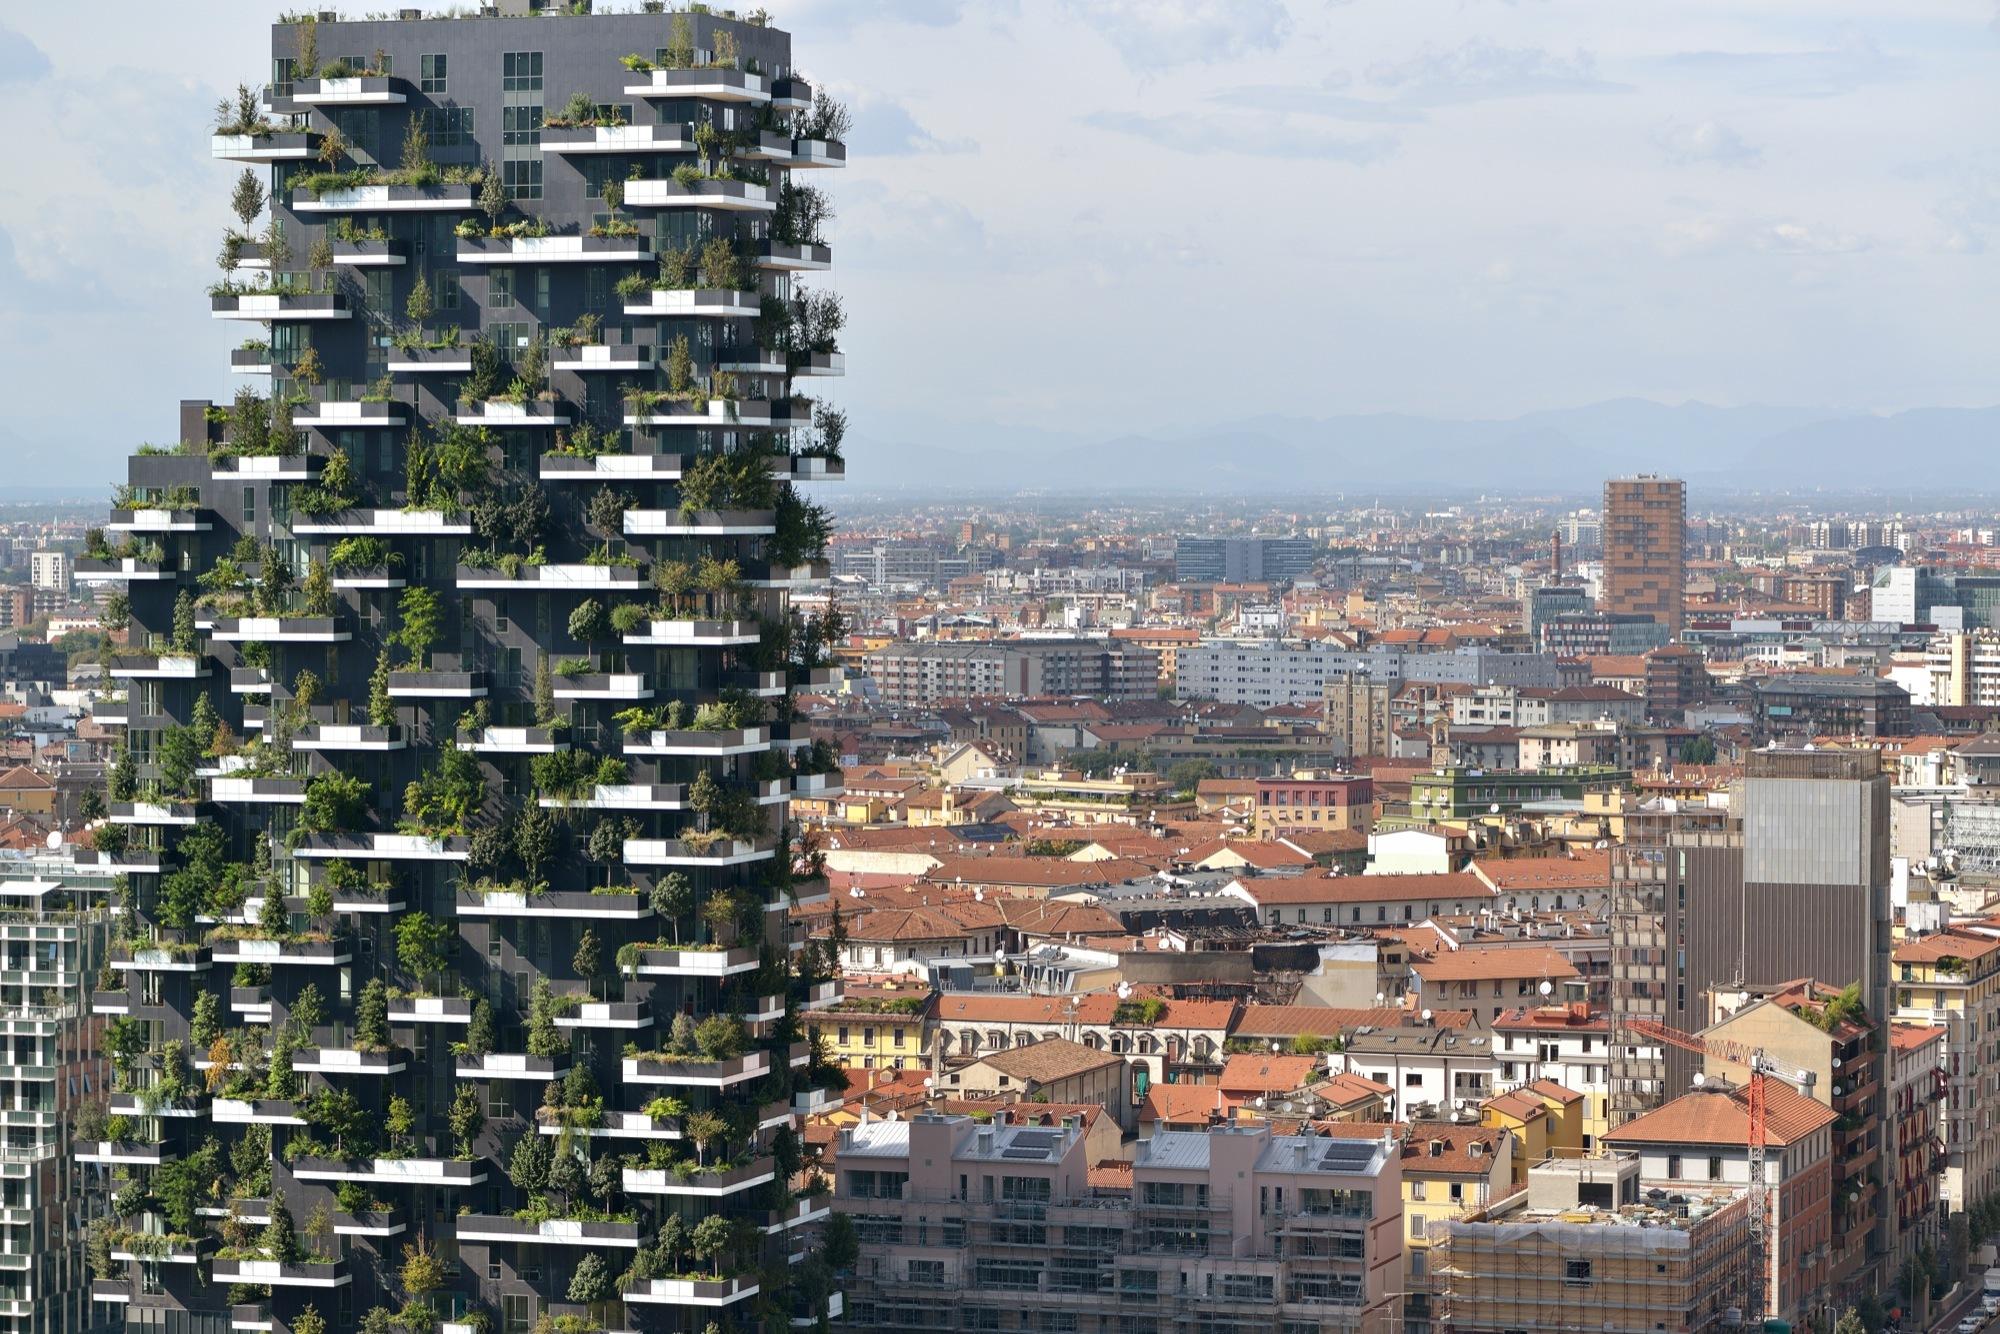 Bosco verticale boeri studio archdaily for Green italy